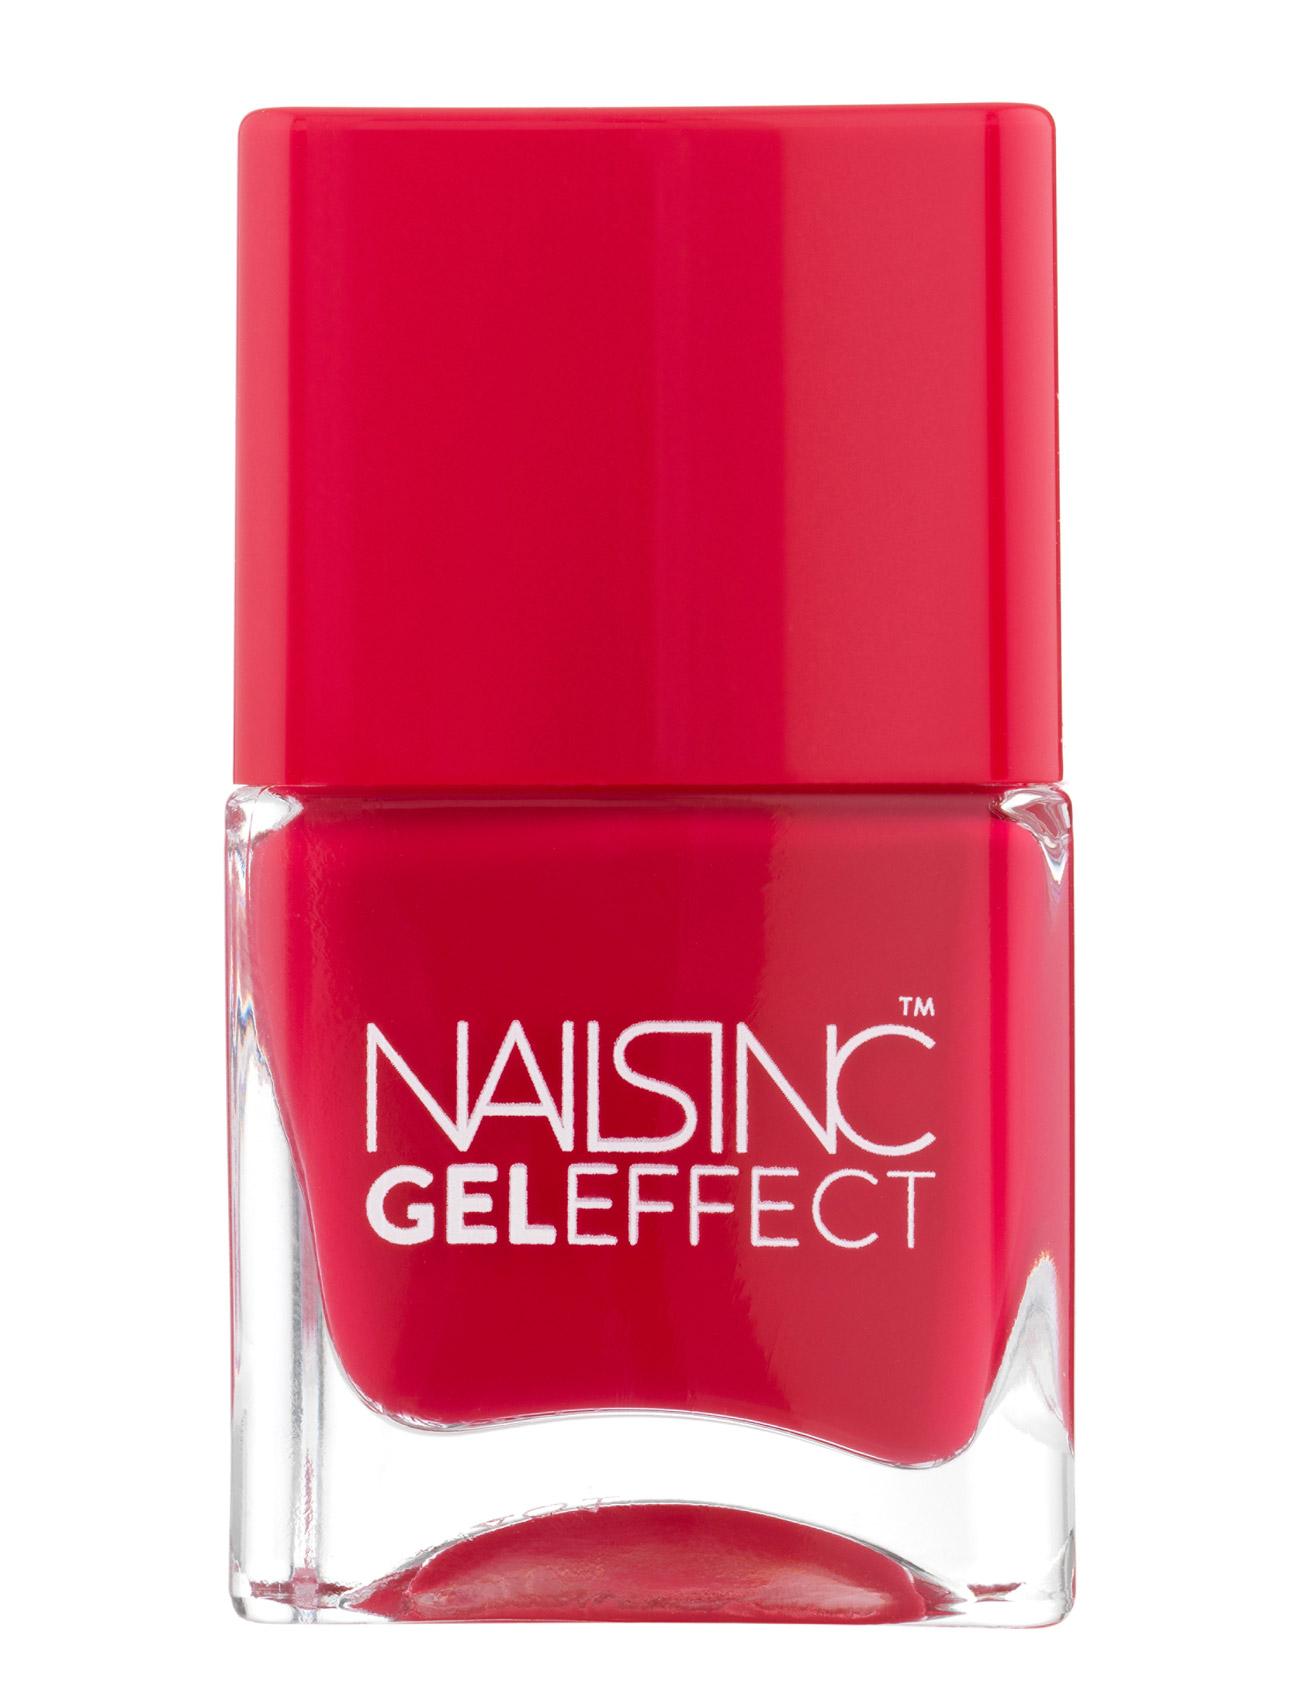 Gel Effect Nailpolish Red Beaufort Street